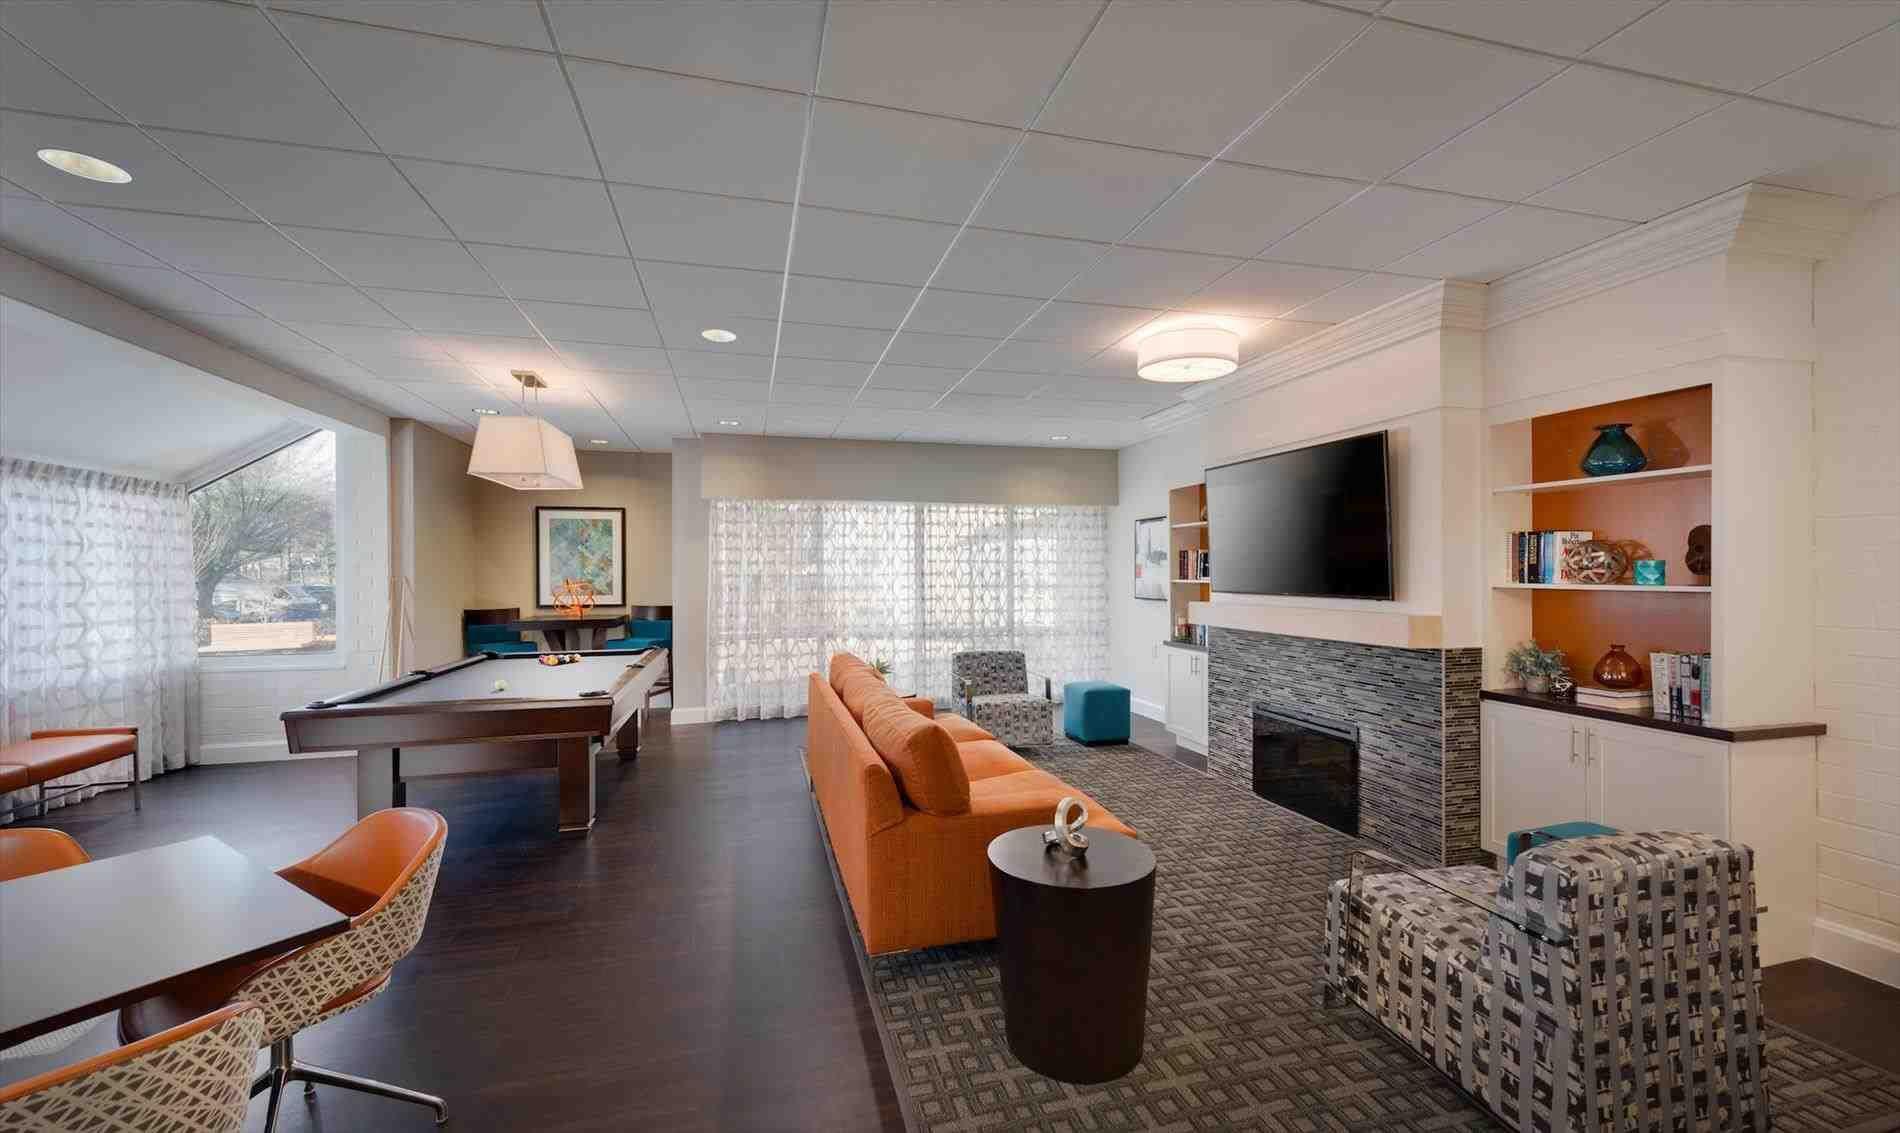 Apartment Baltimore - the-baltimore-city-guide-where-to ...